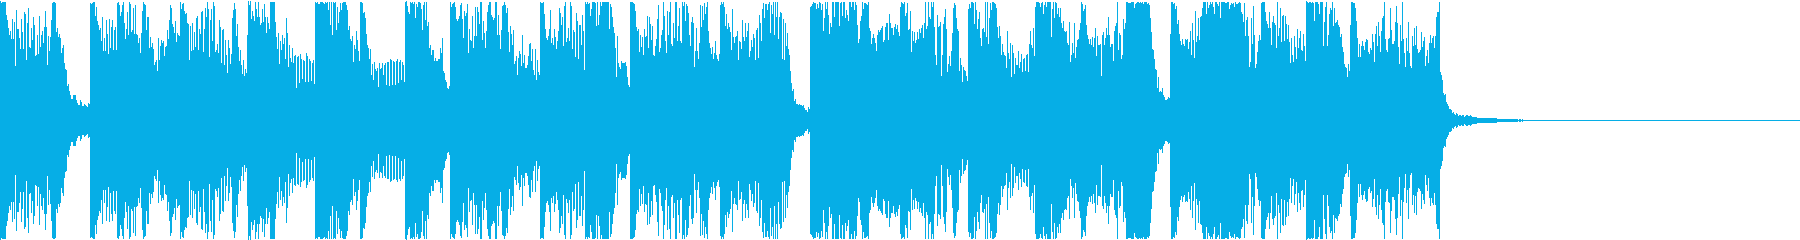 Pop/Houseの再生済みの波形